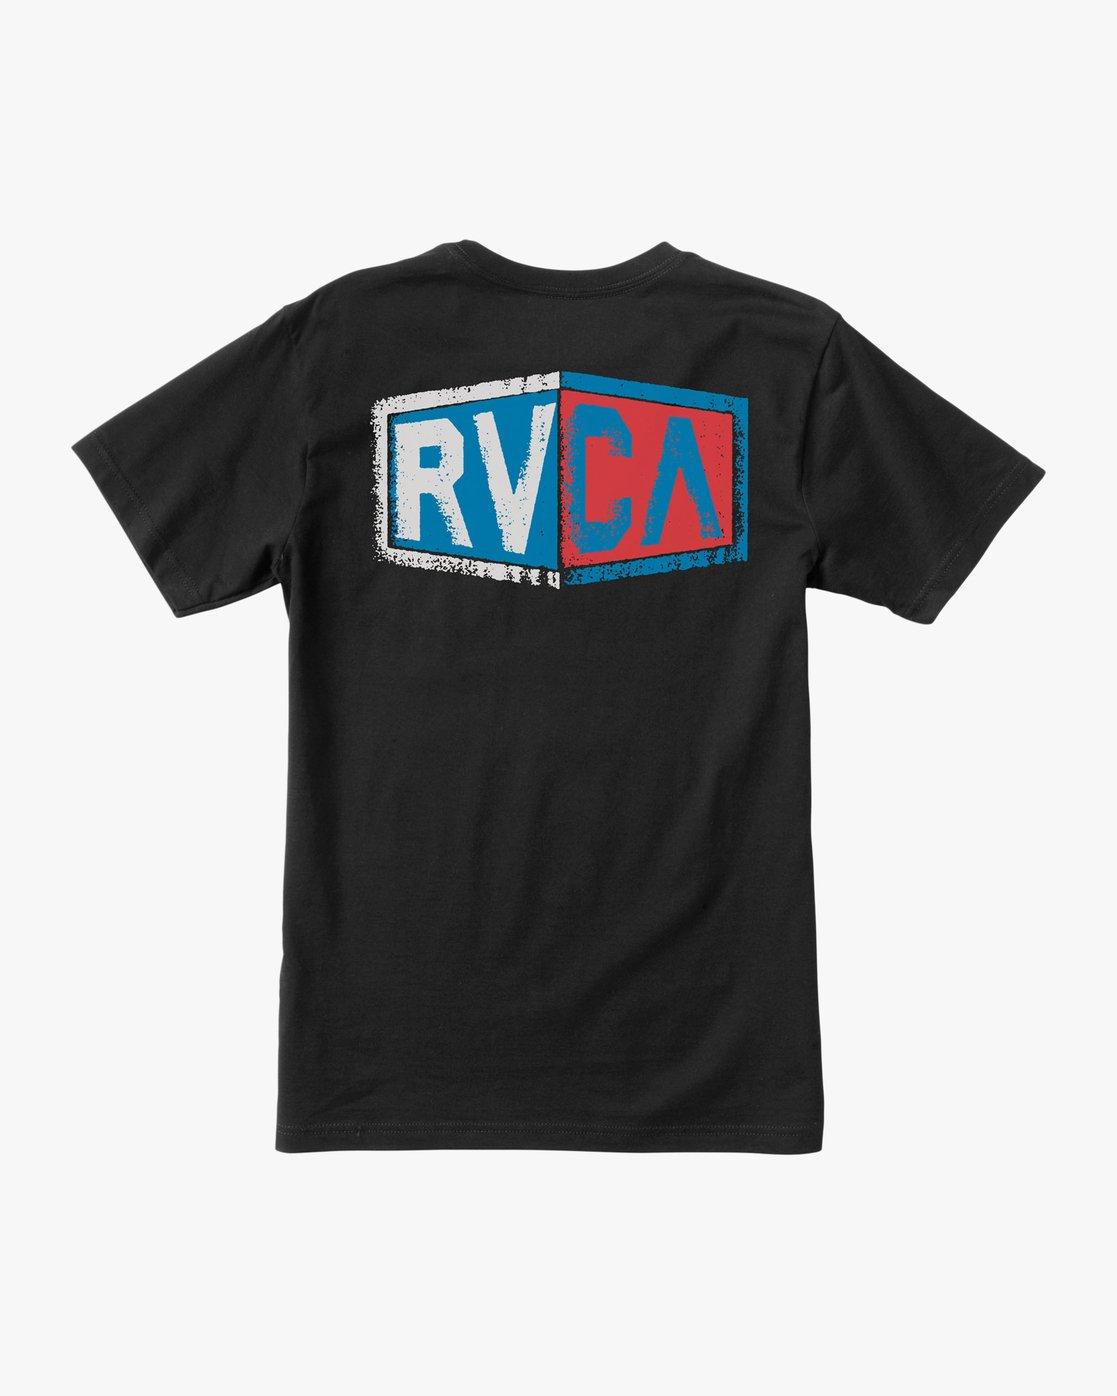 0 Carborator T-Shirt Black M412TRCA RVCA